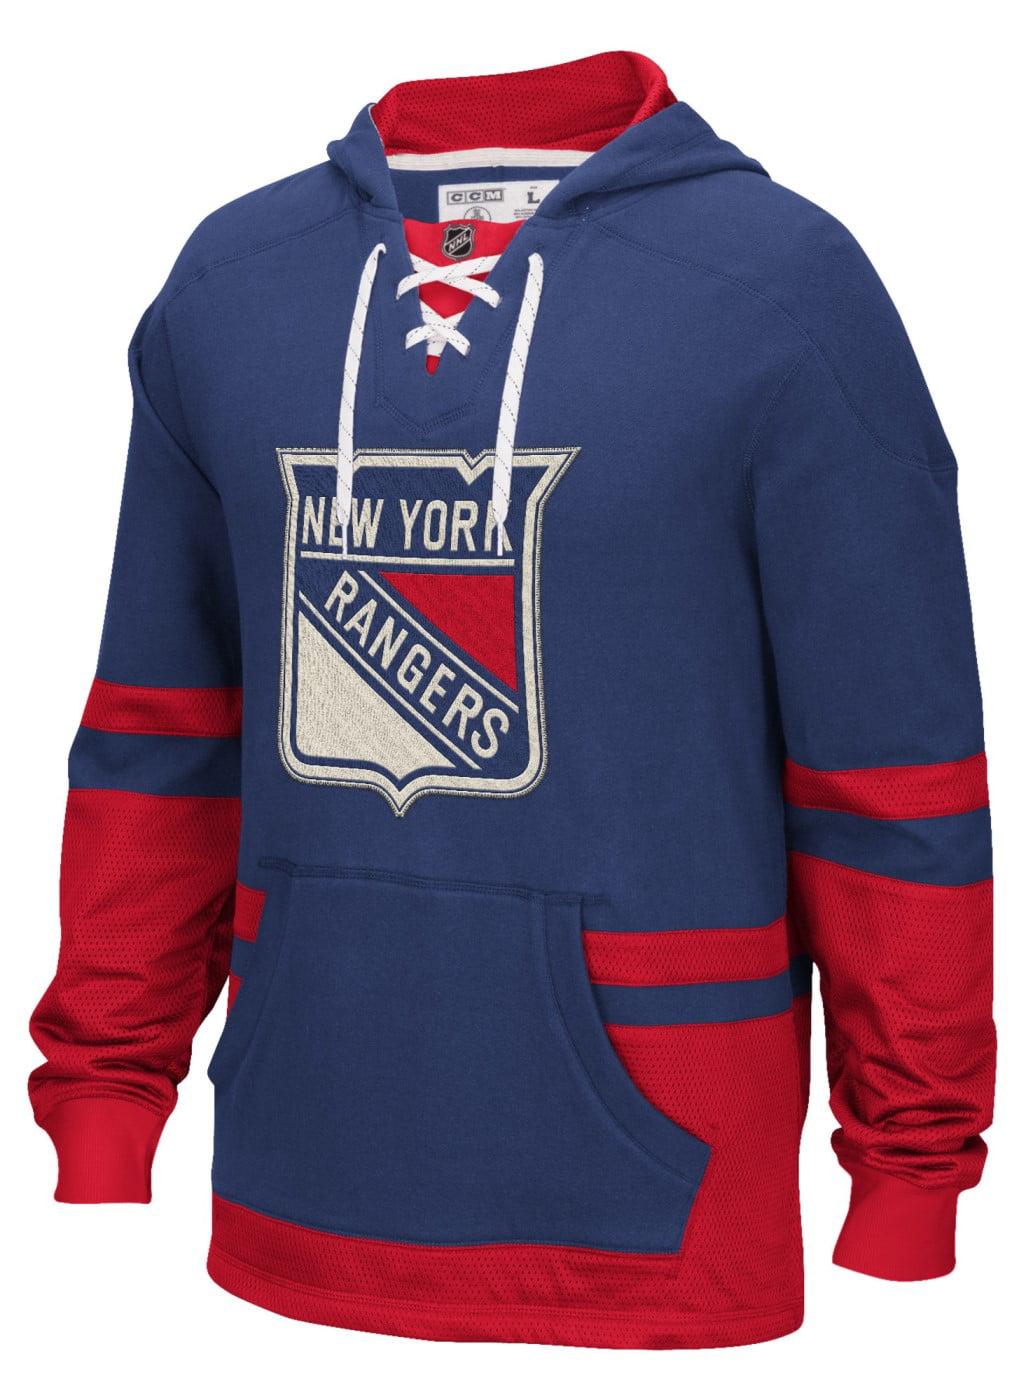 "New York Rangers CCM NHL ""Hit the Boards"" Men's Vintage Jersey Sweatshirt by Reebok"